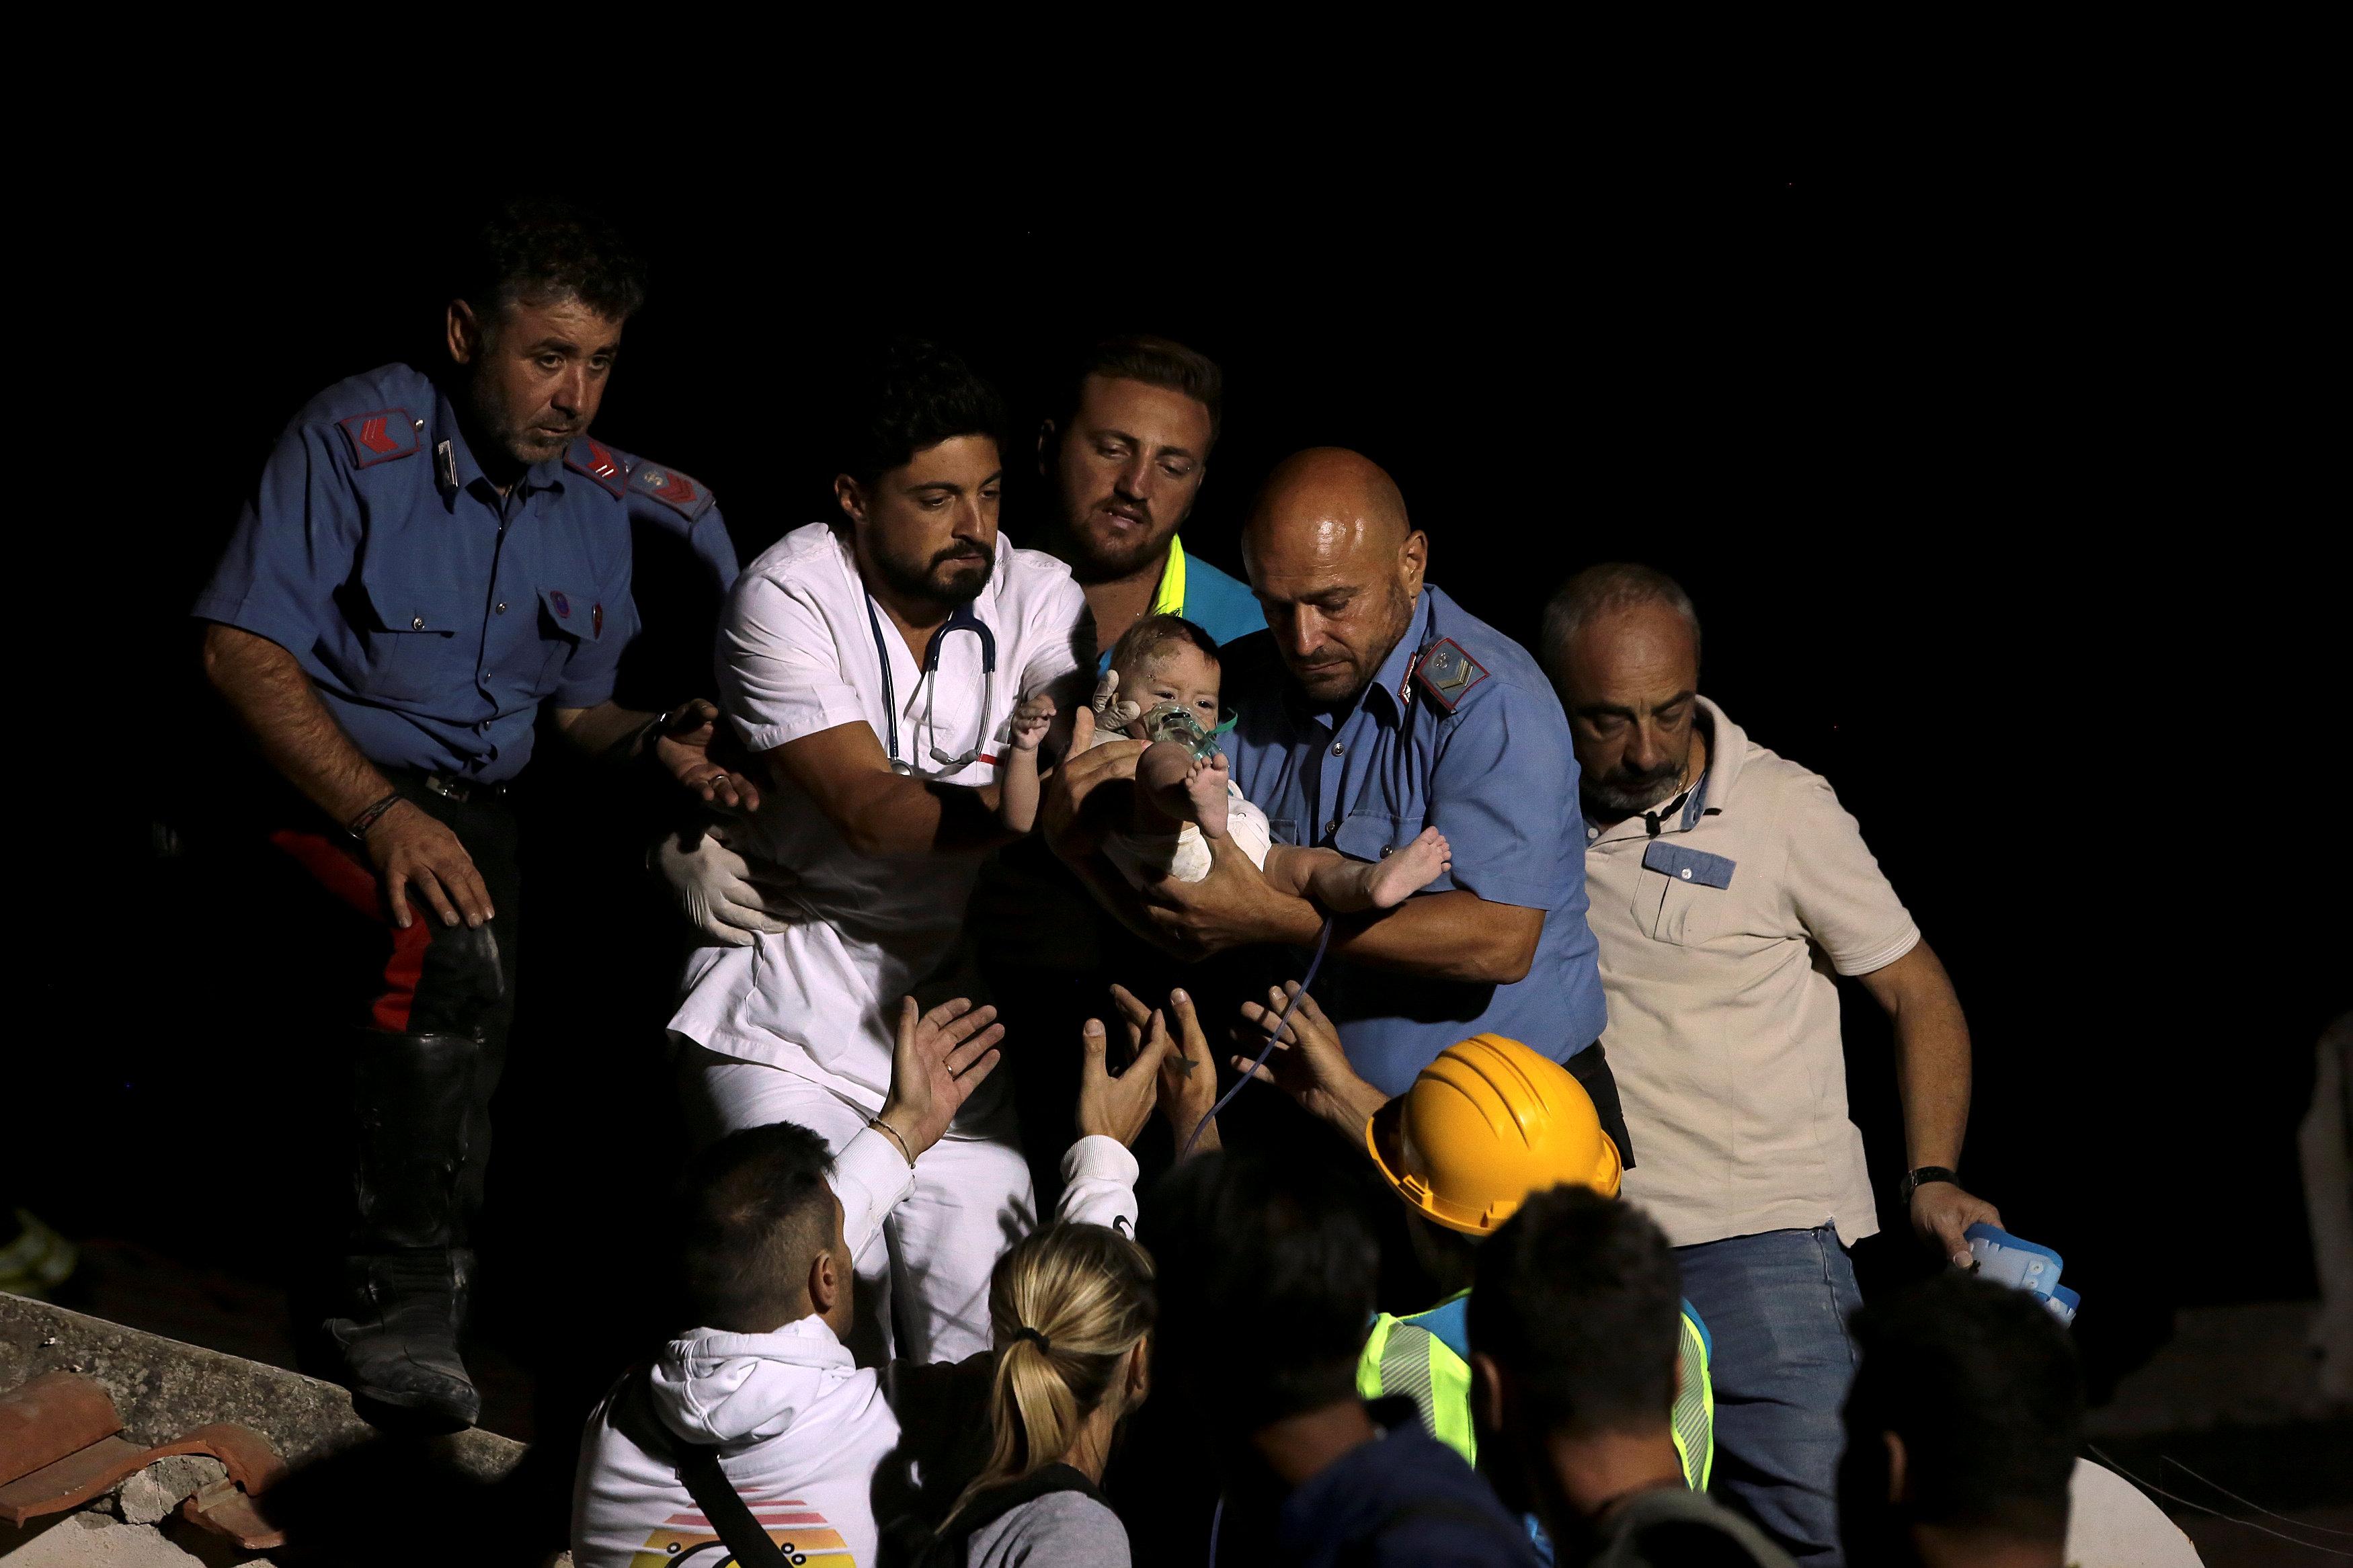 Terremoto a Ischia, anche bambini sotto le macerie